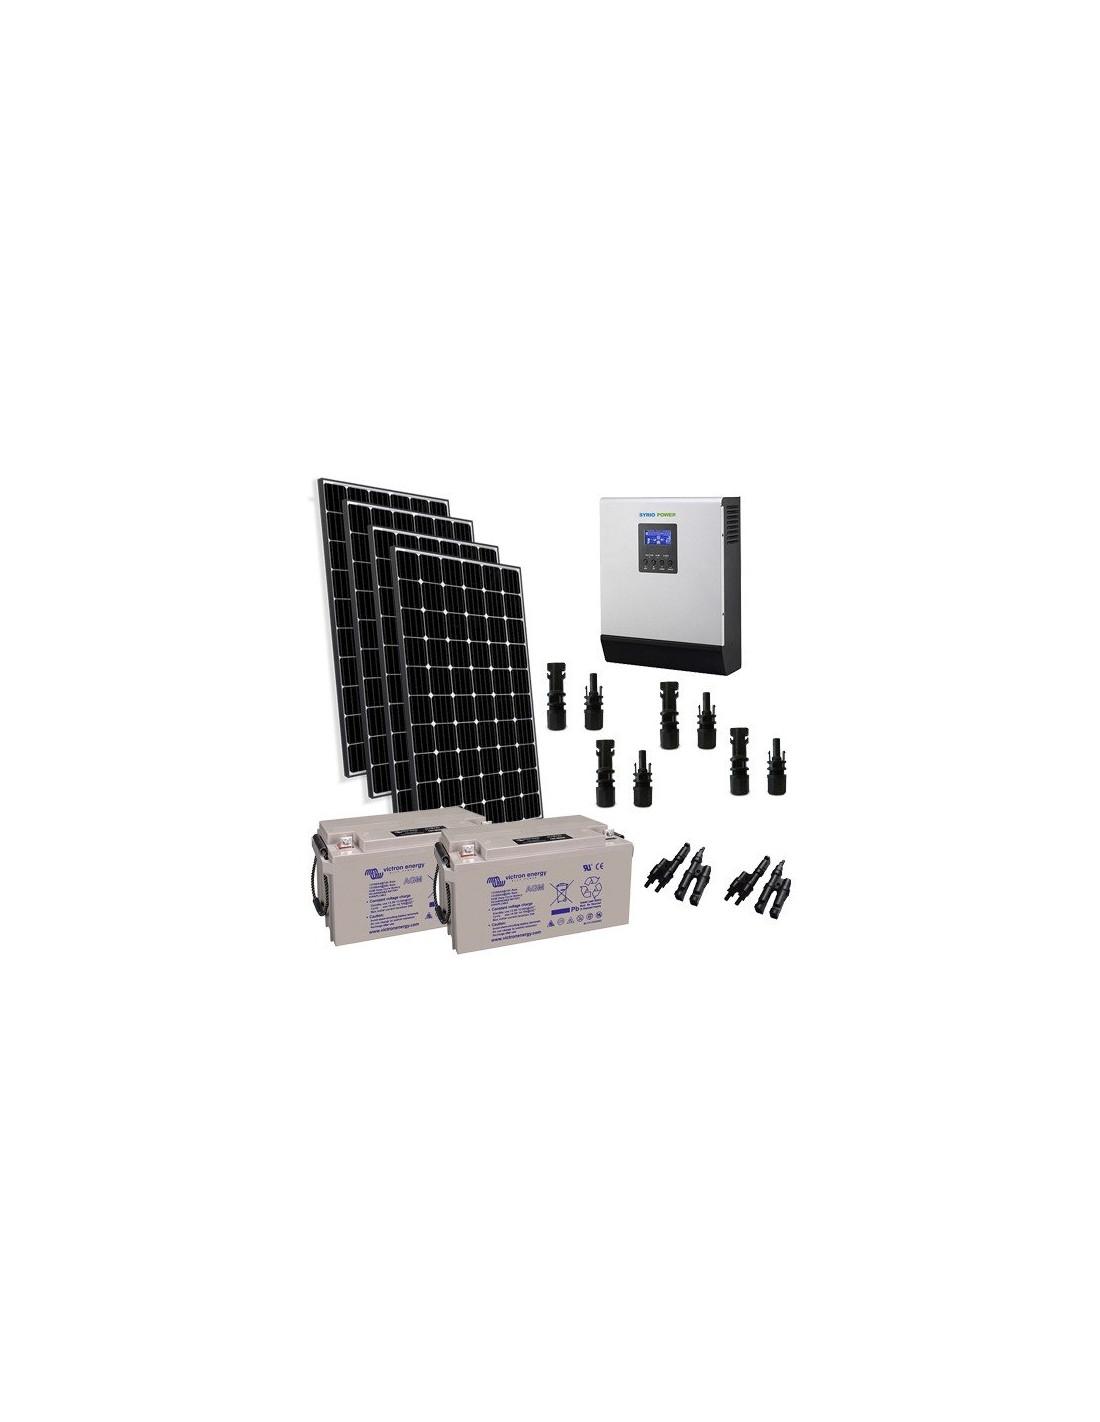 Kit Pannello Solare Batteria Inverter : Kit solare baita w v pro pannello europeo inverter